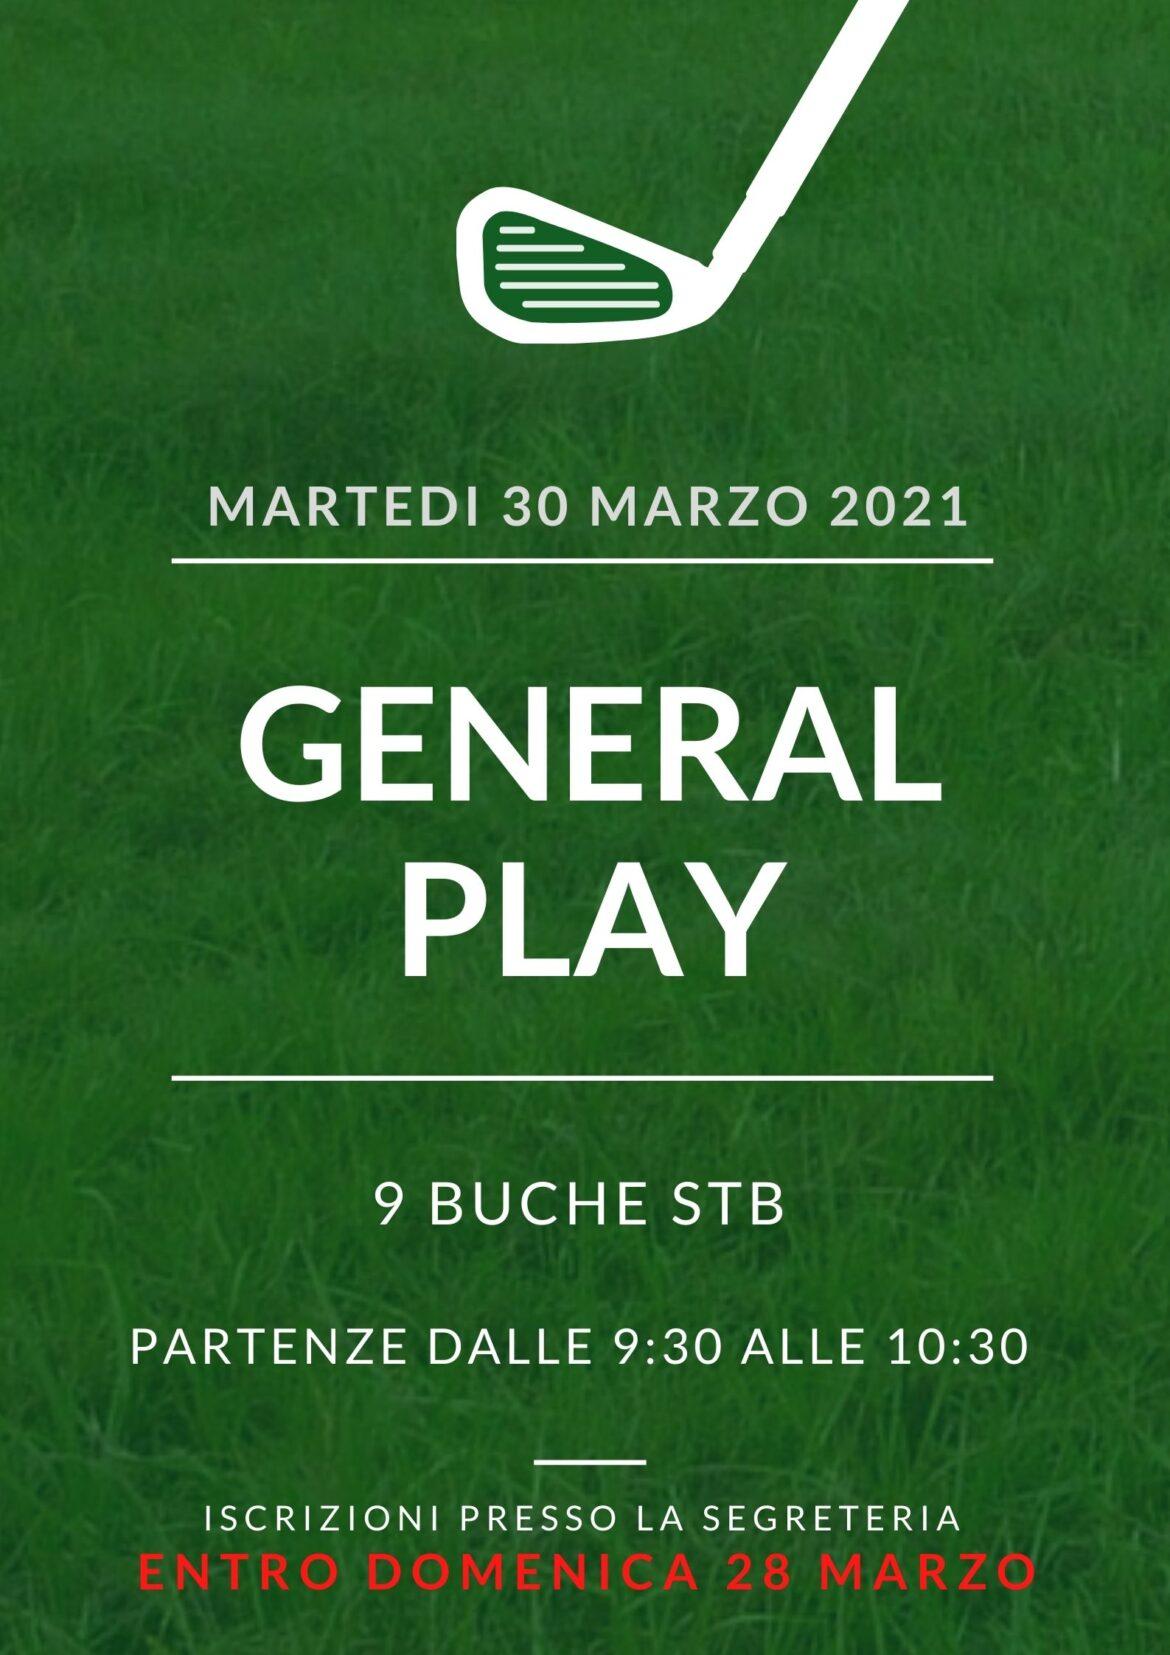 GENERAL PLAY martedì 30 marzo 2021